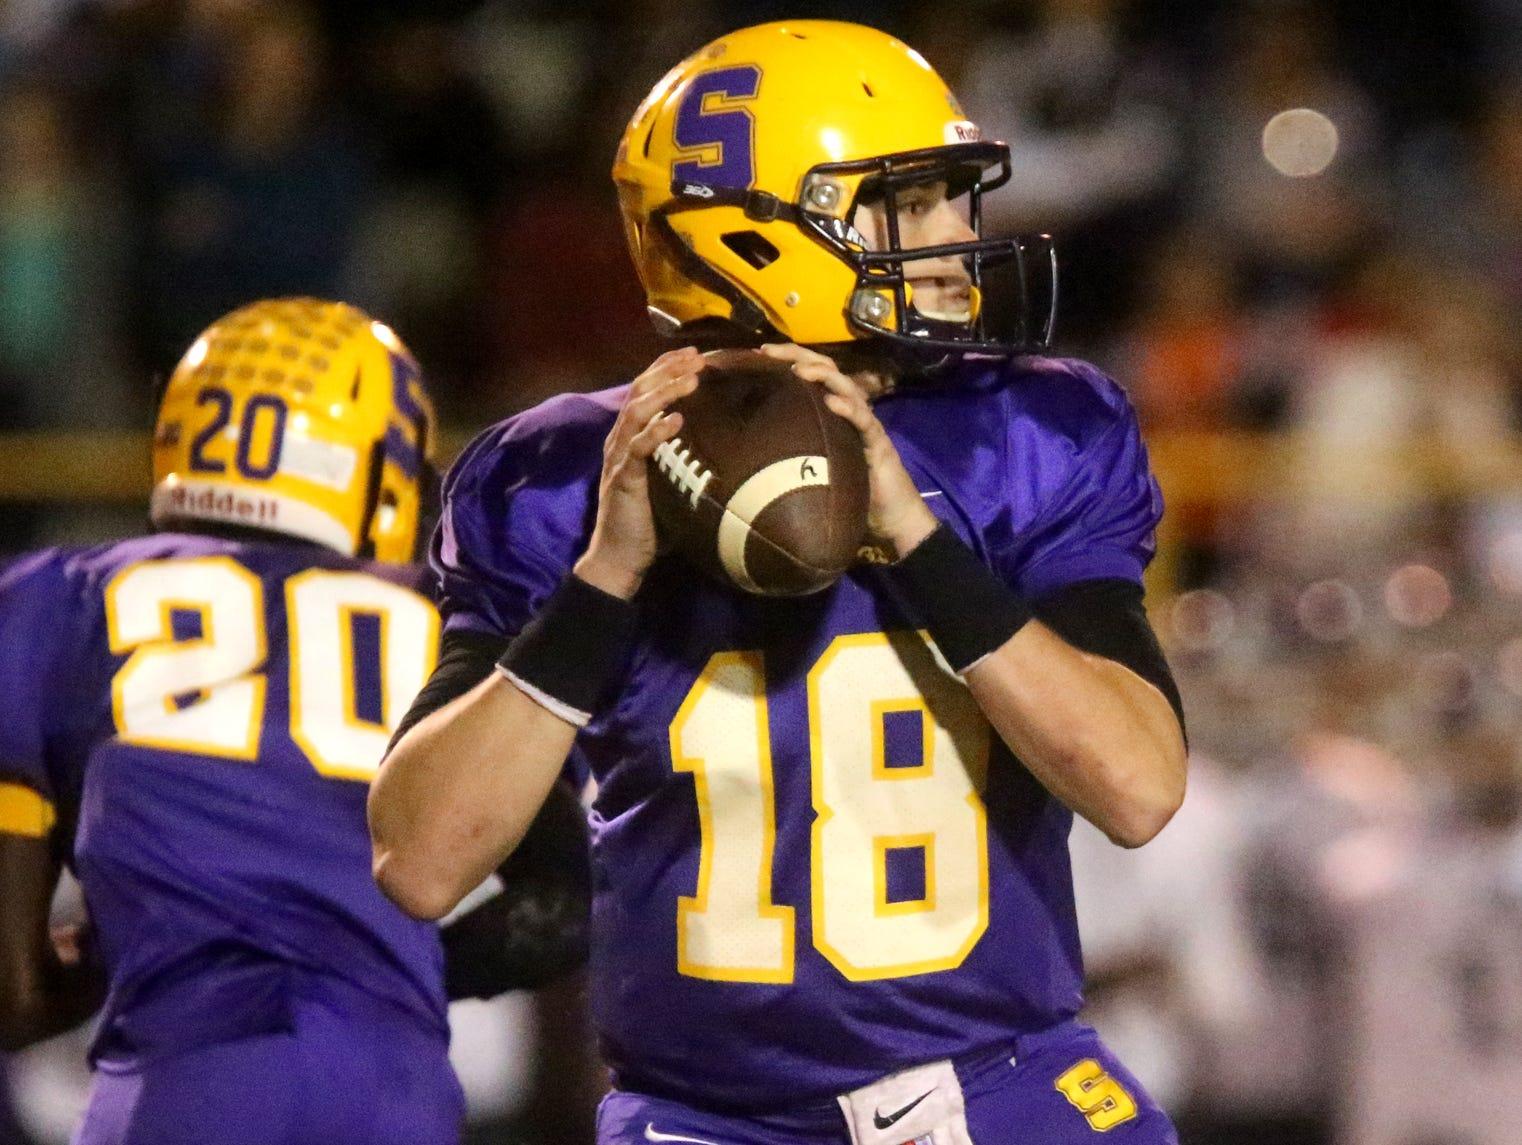 Smyrna quarterback John Turner has committed to MTSU